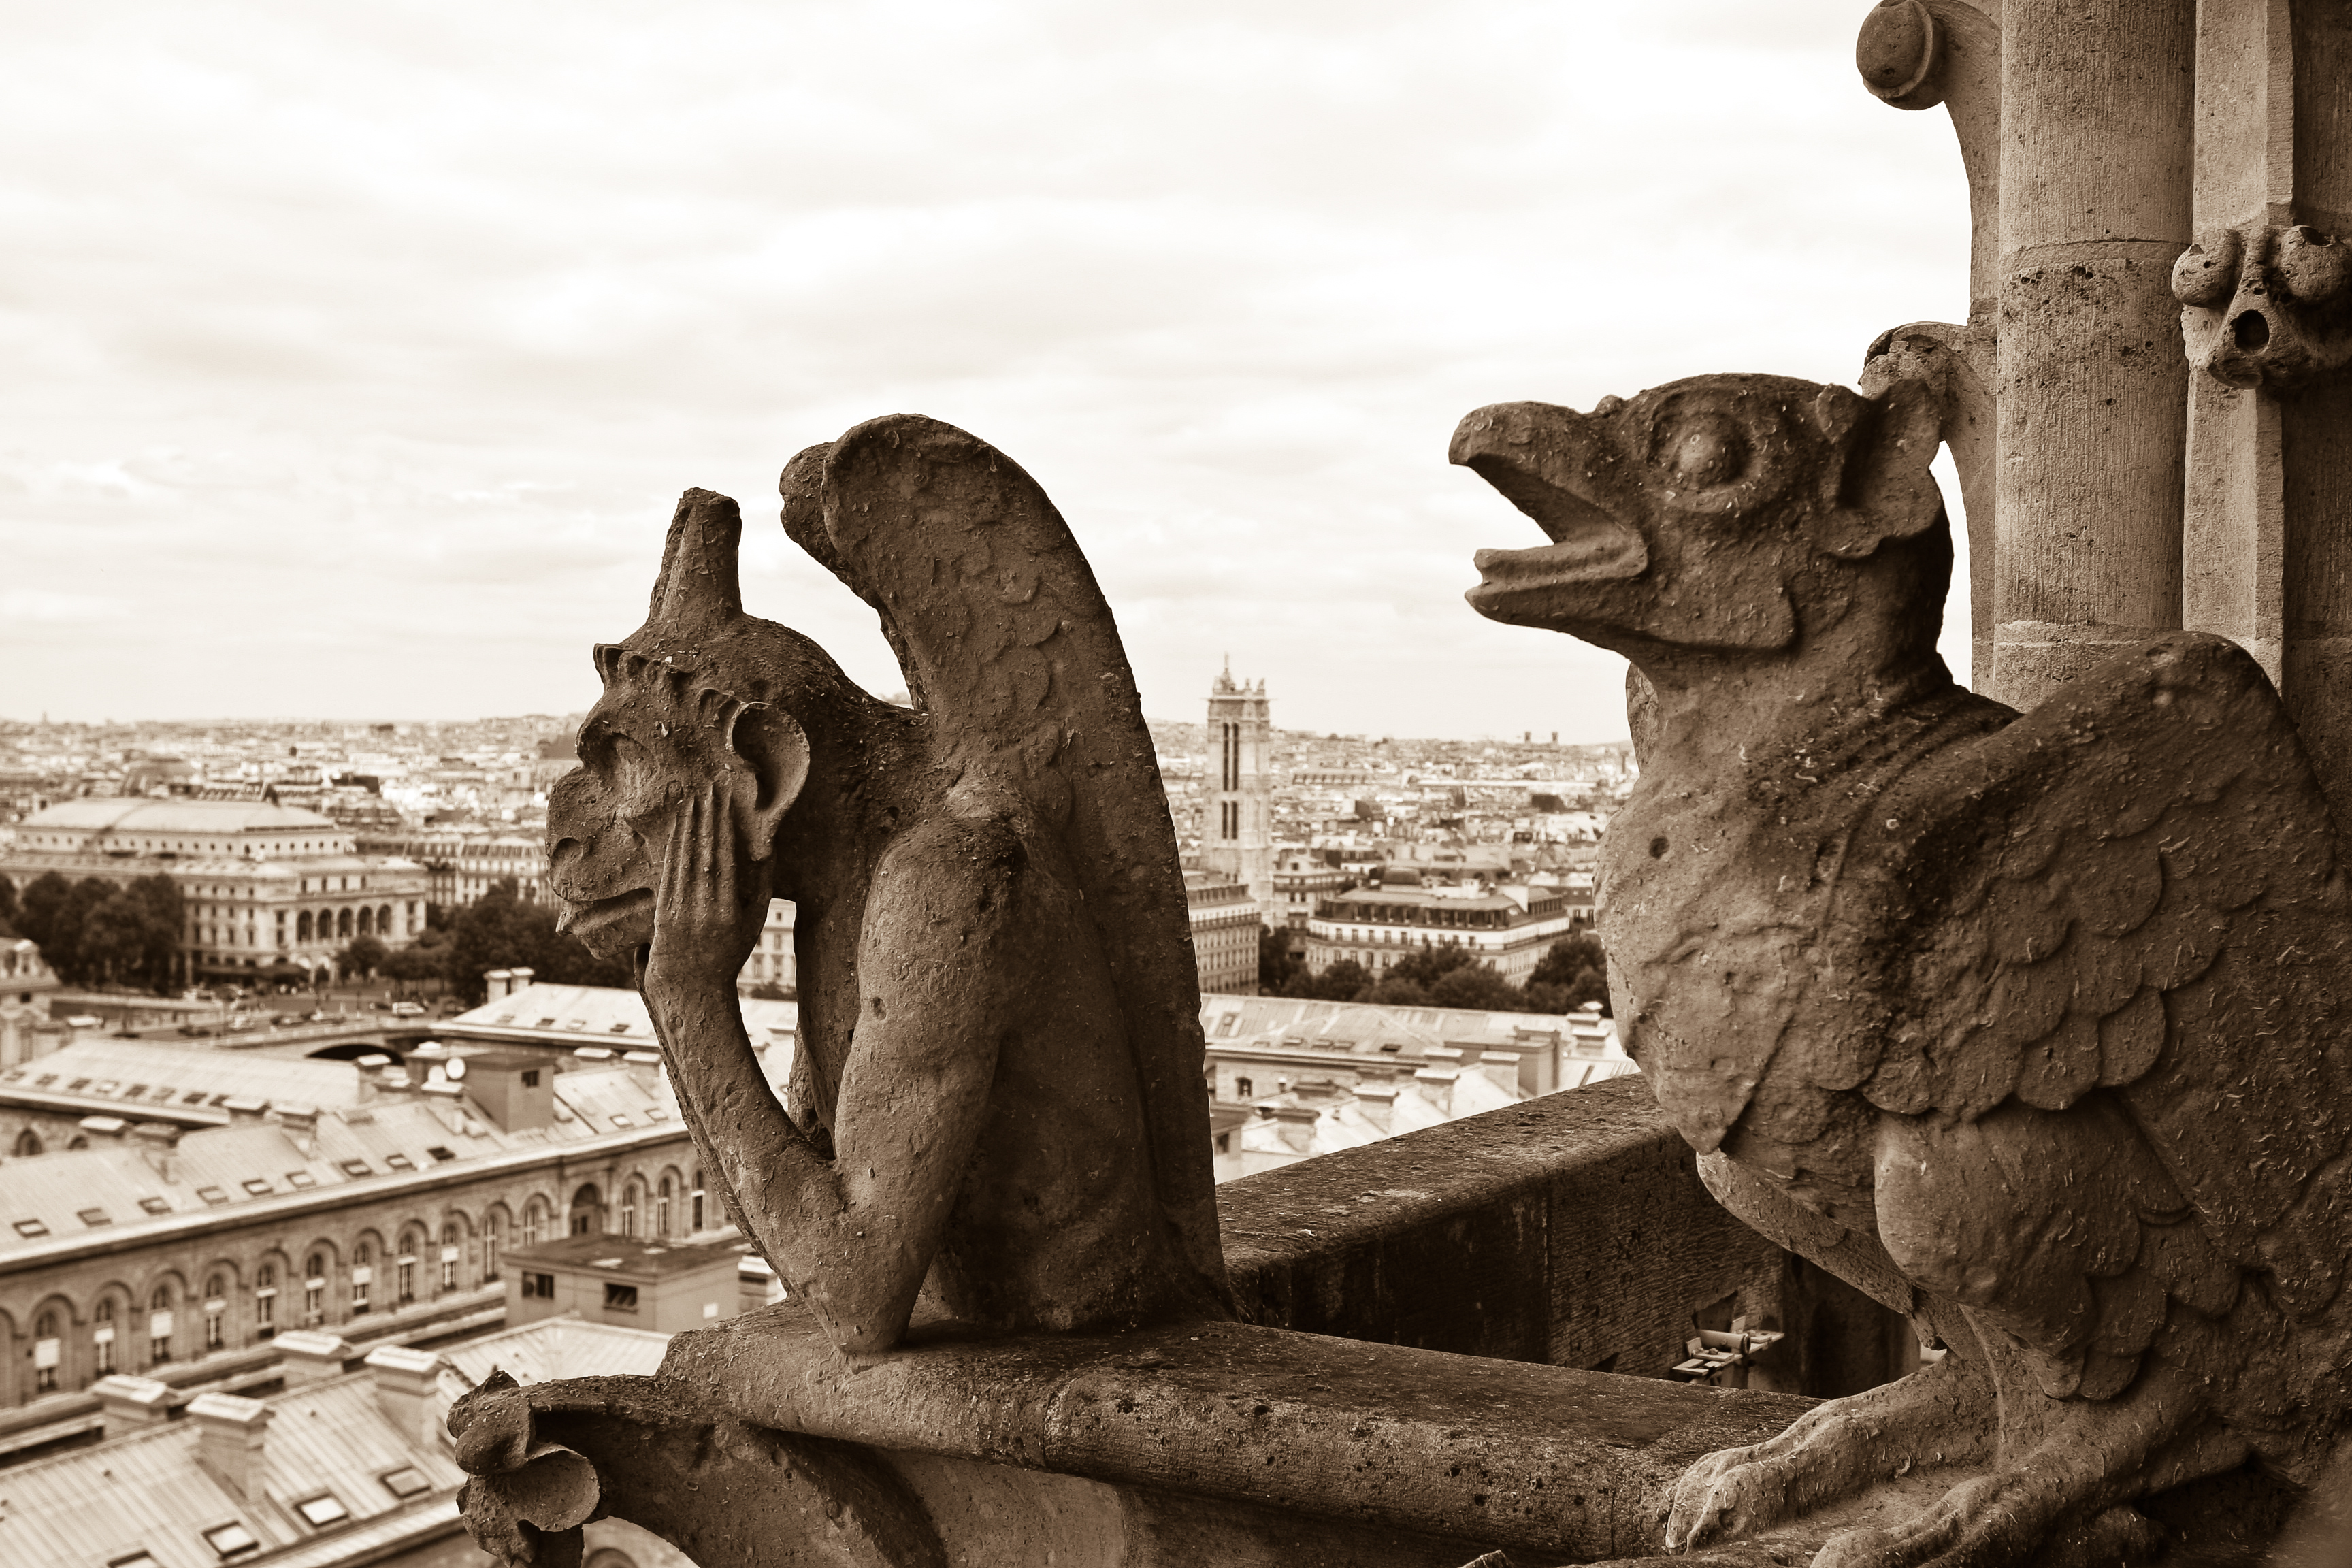 File:Gargoyles, Notre-Dame, Paris (3584514985).jpg - Wikimedia Commons